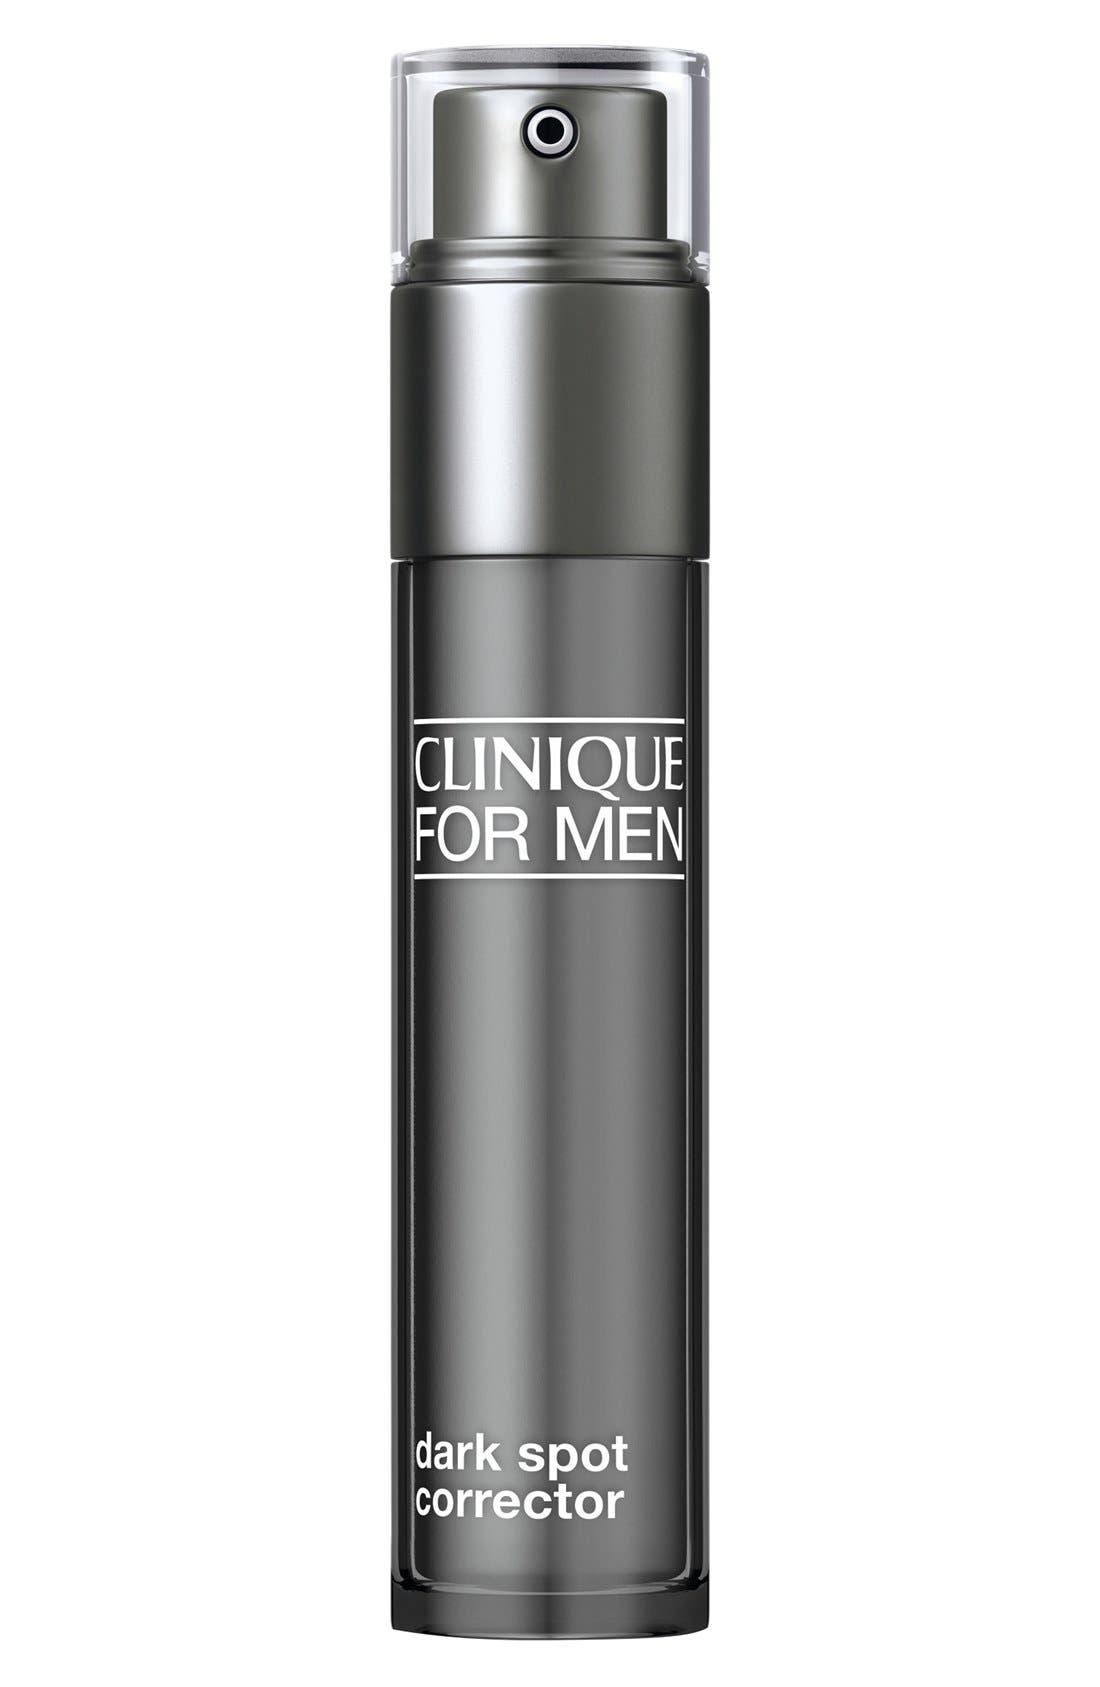 Clinique for Men Dark Spot Corrector